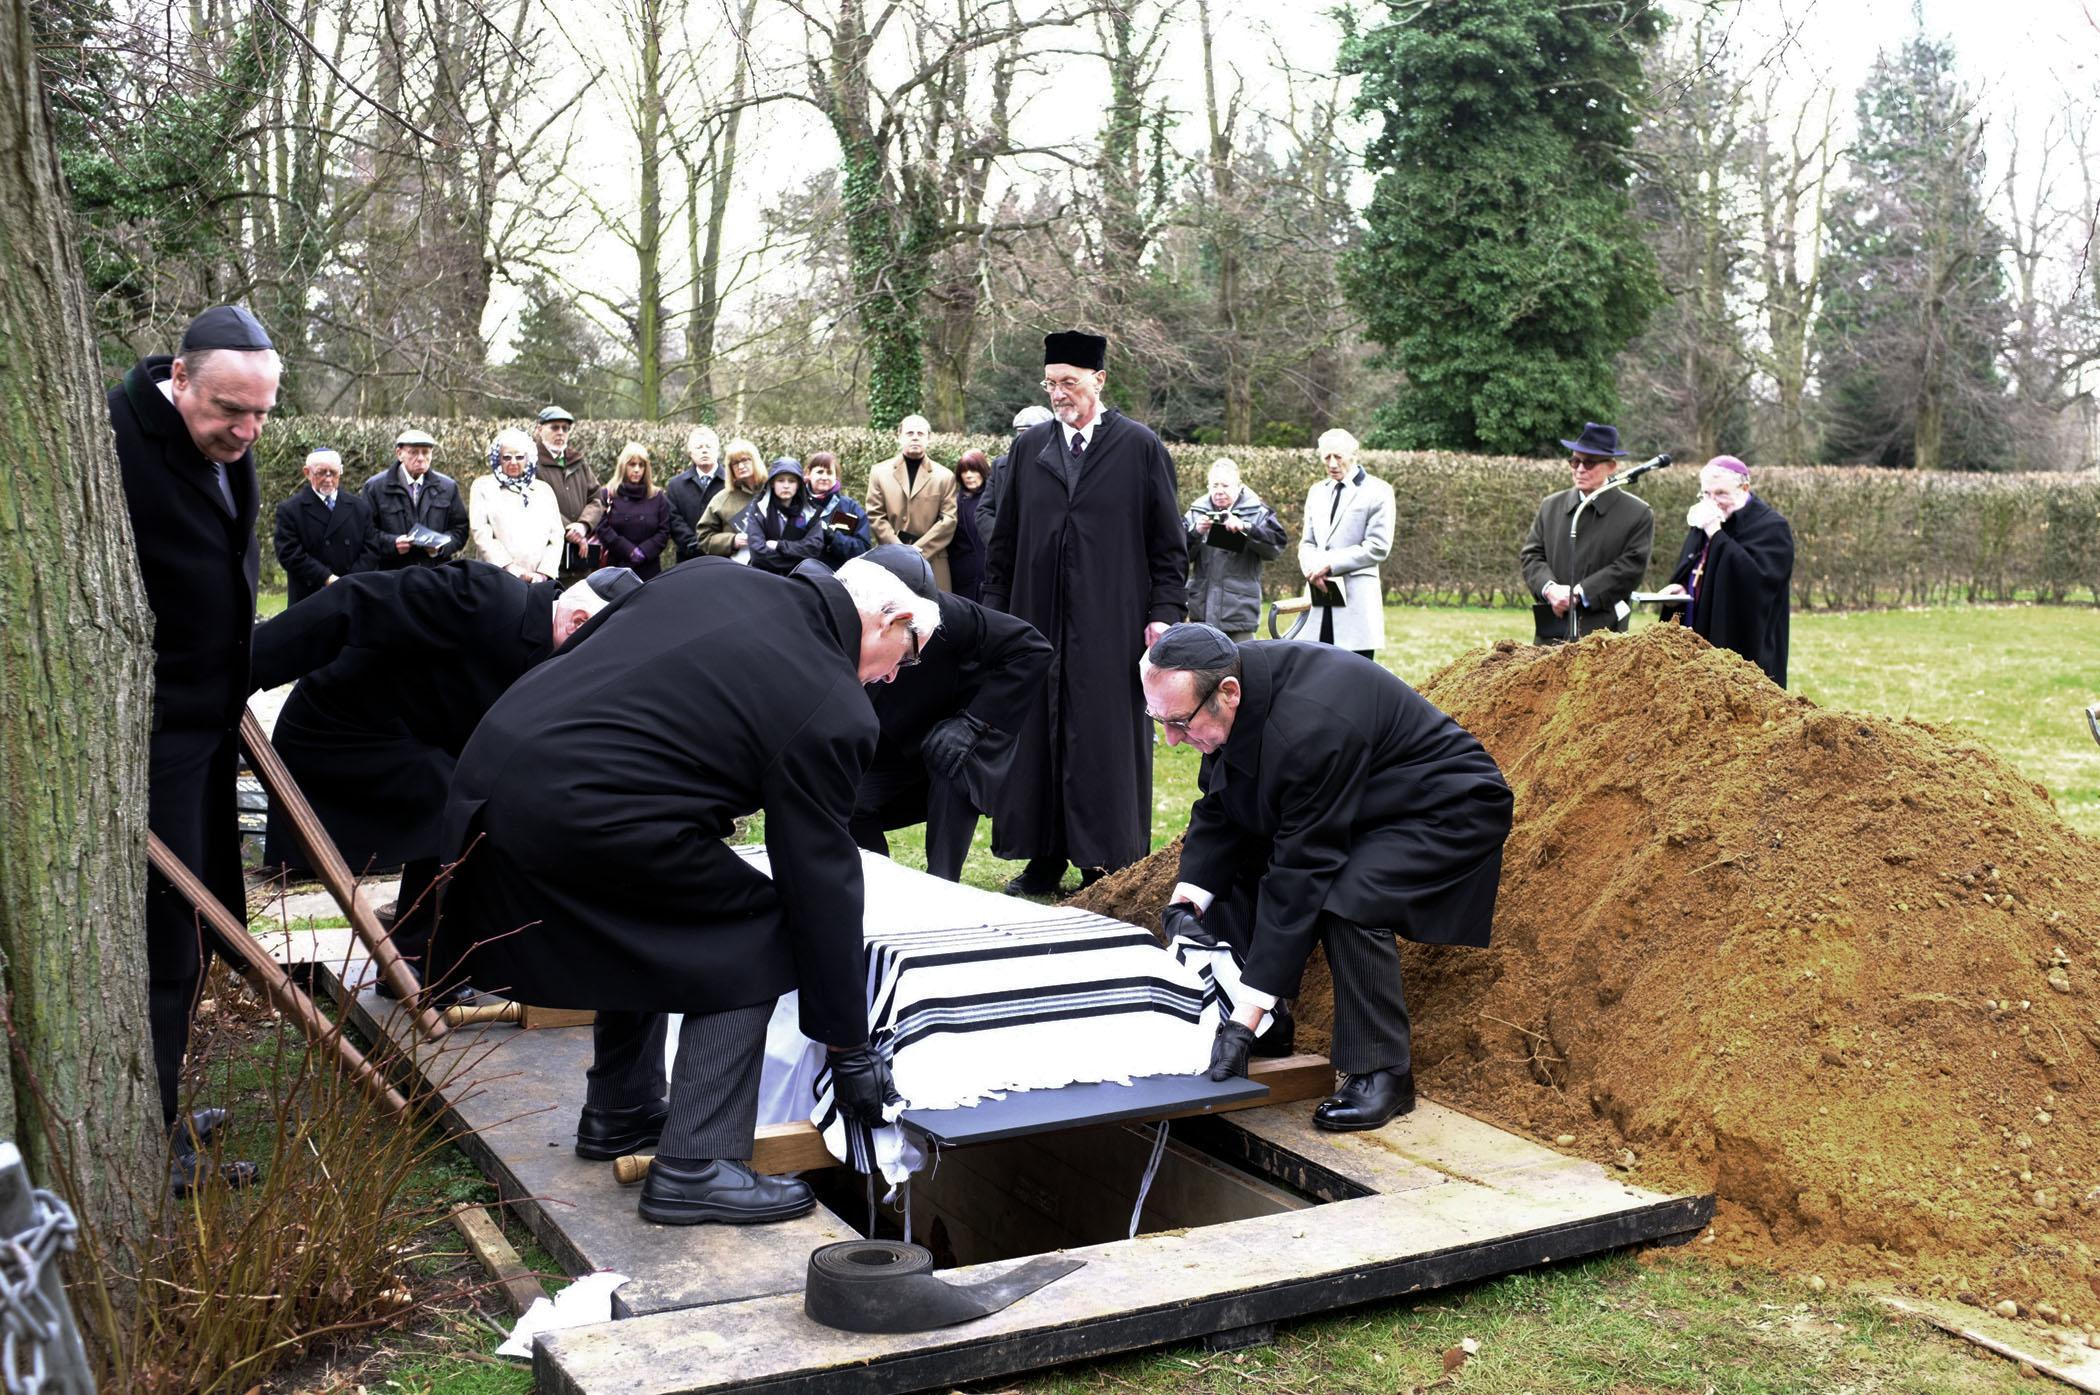 Secrets of the norwich blood libel ou life norwich libel burial funeral izmirmasajfo